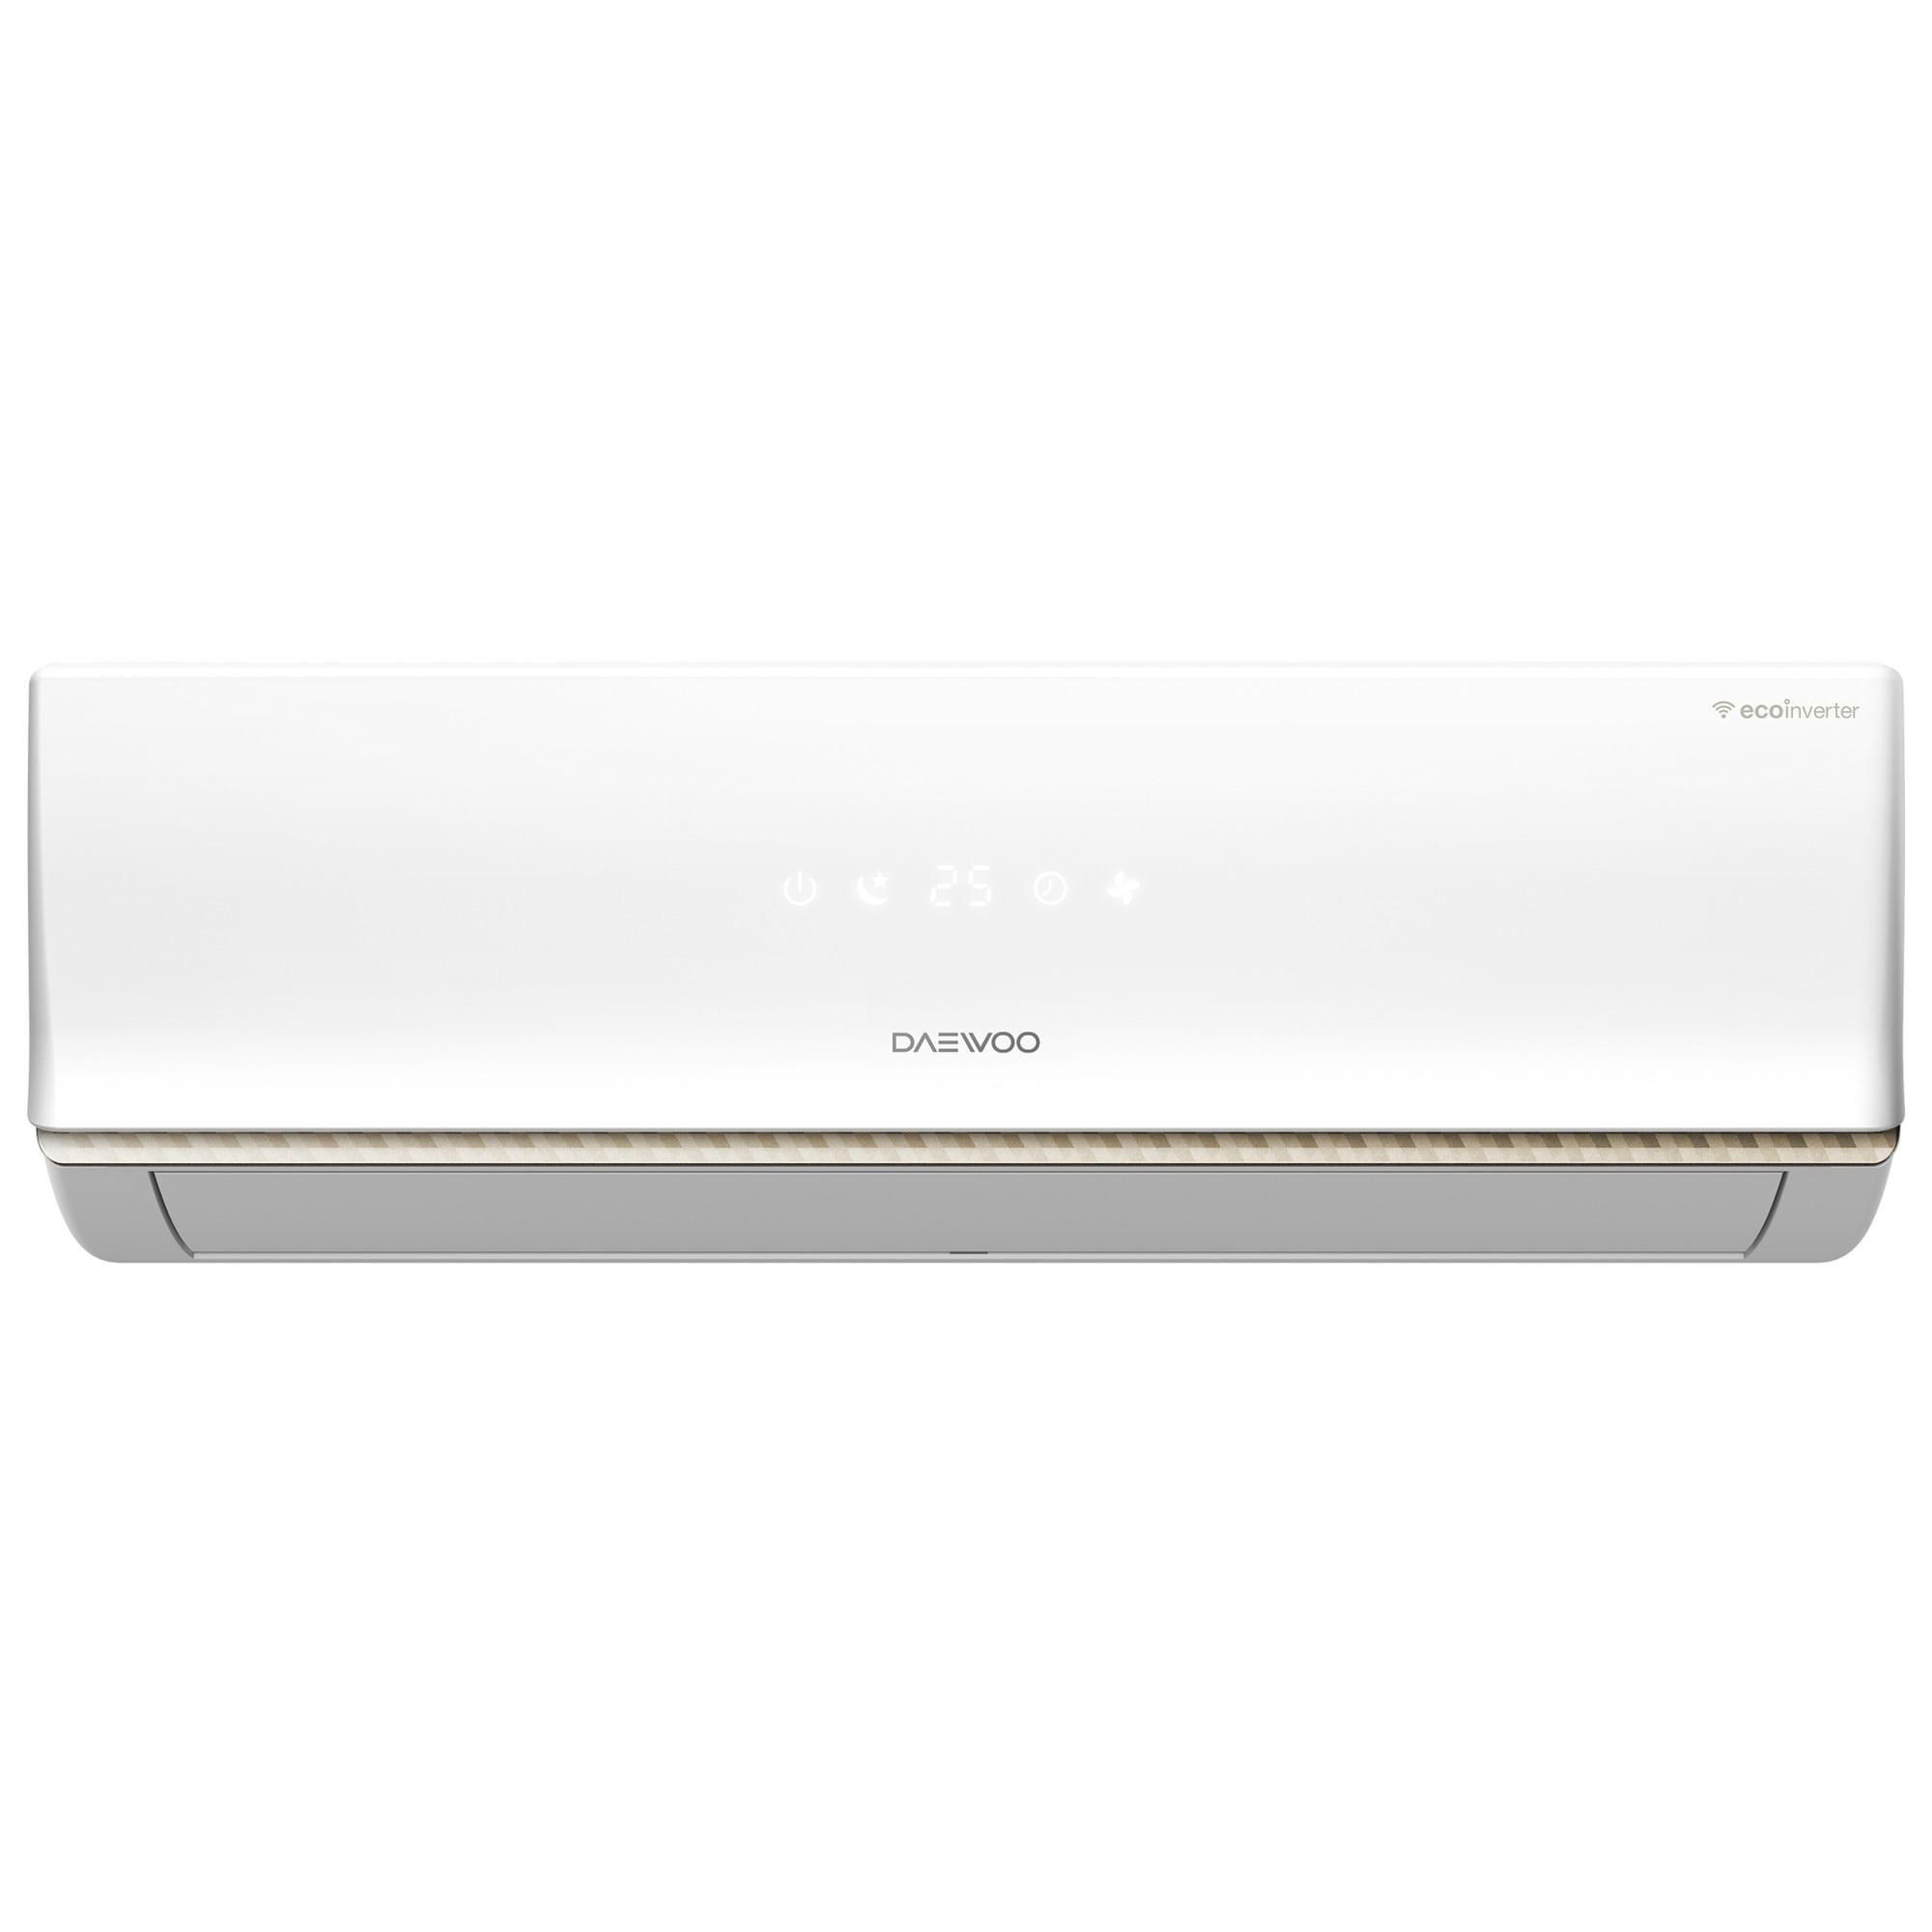 Fotografie Aparat de aer conditionat Daewoo 24000 BTU Wi-Fi, Clasa A++, kit instalare inclus, 4 directii de ventilare, DSB-H2402JLH-VKW, Alb